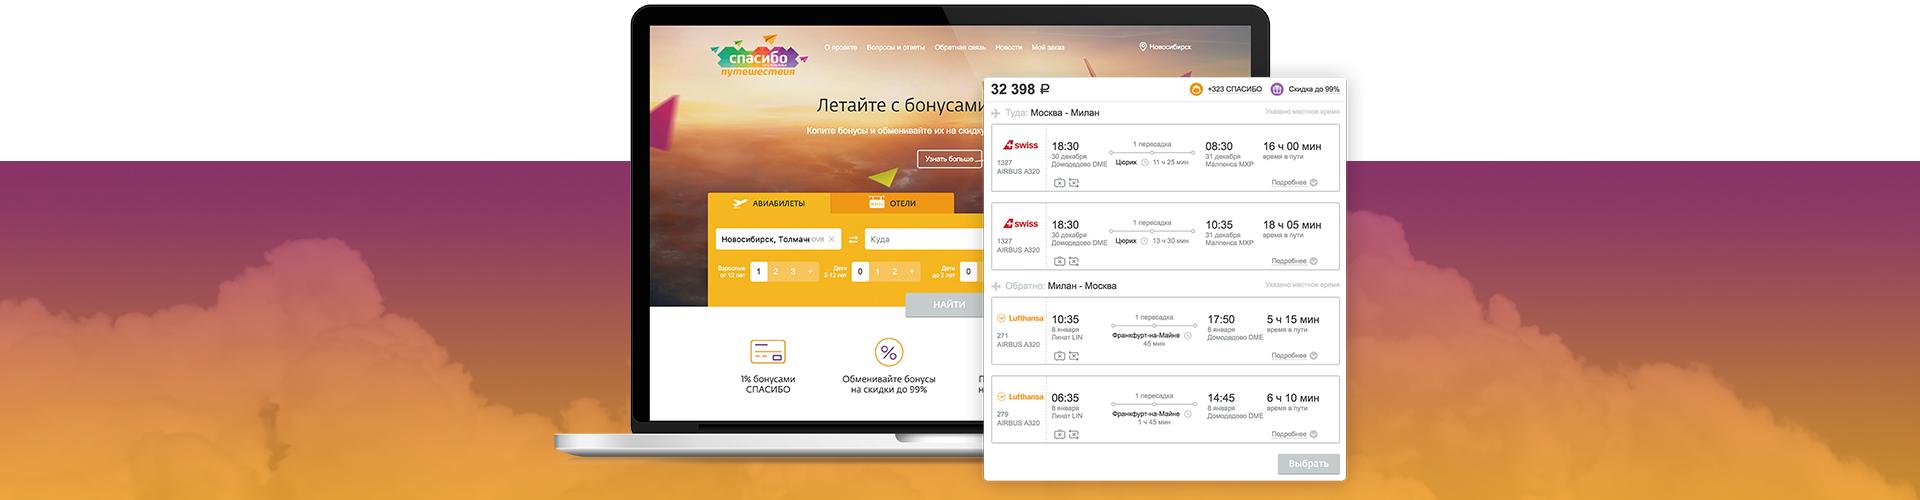 Web Portal Spasibosberbank.travel